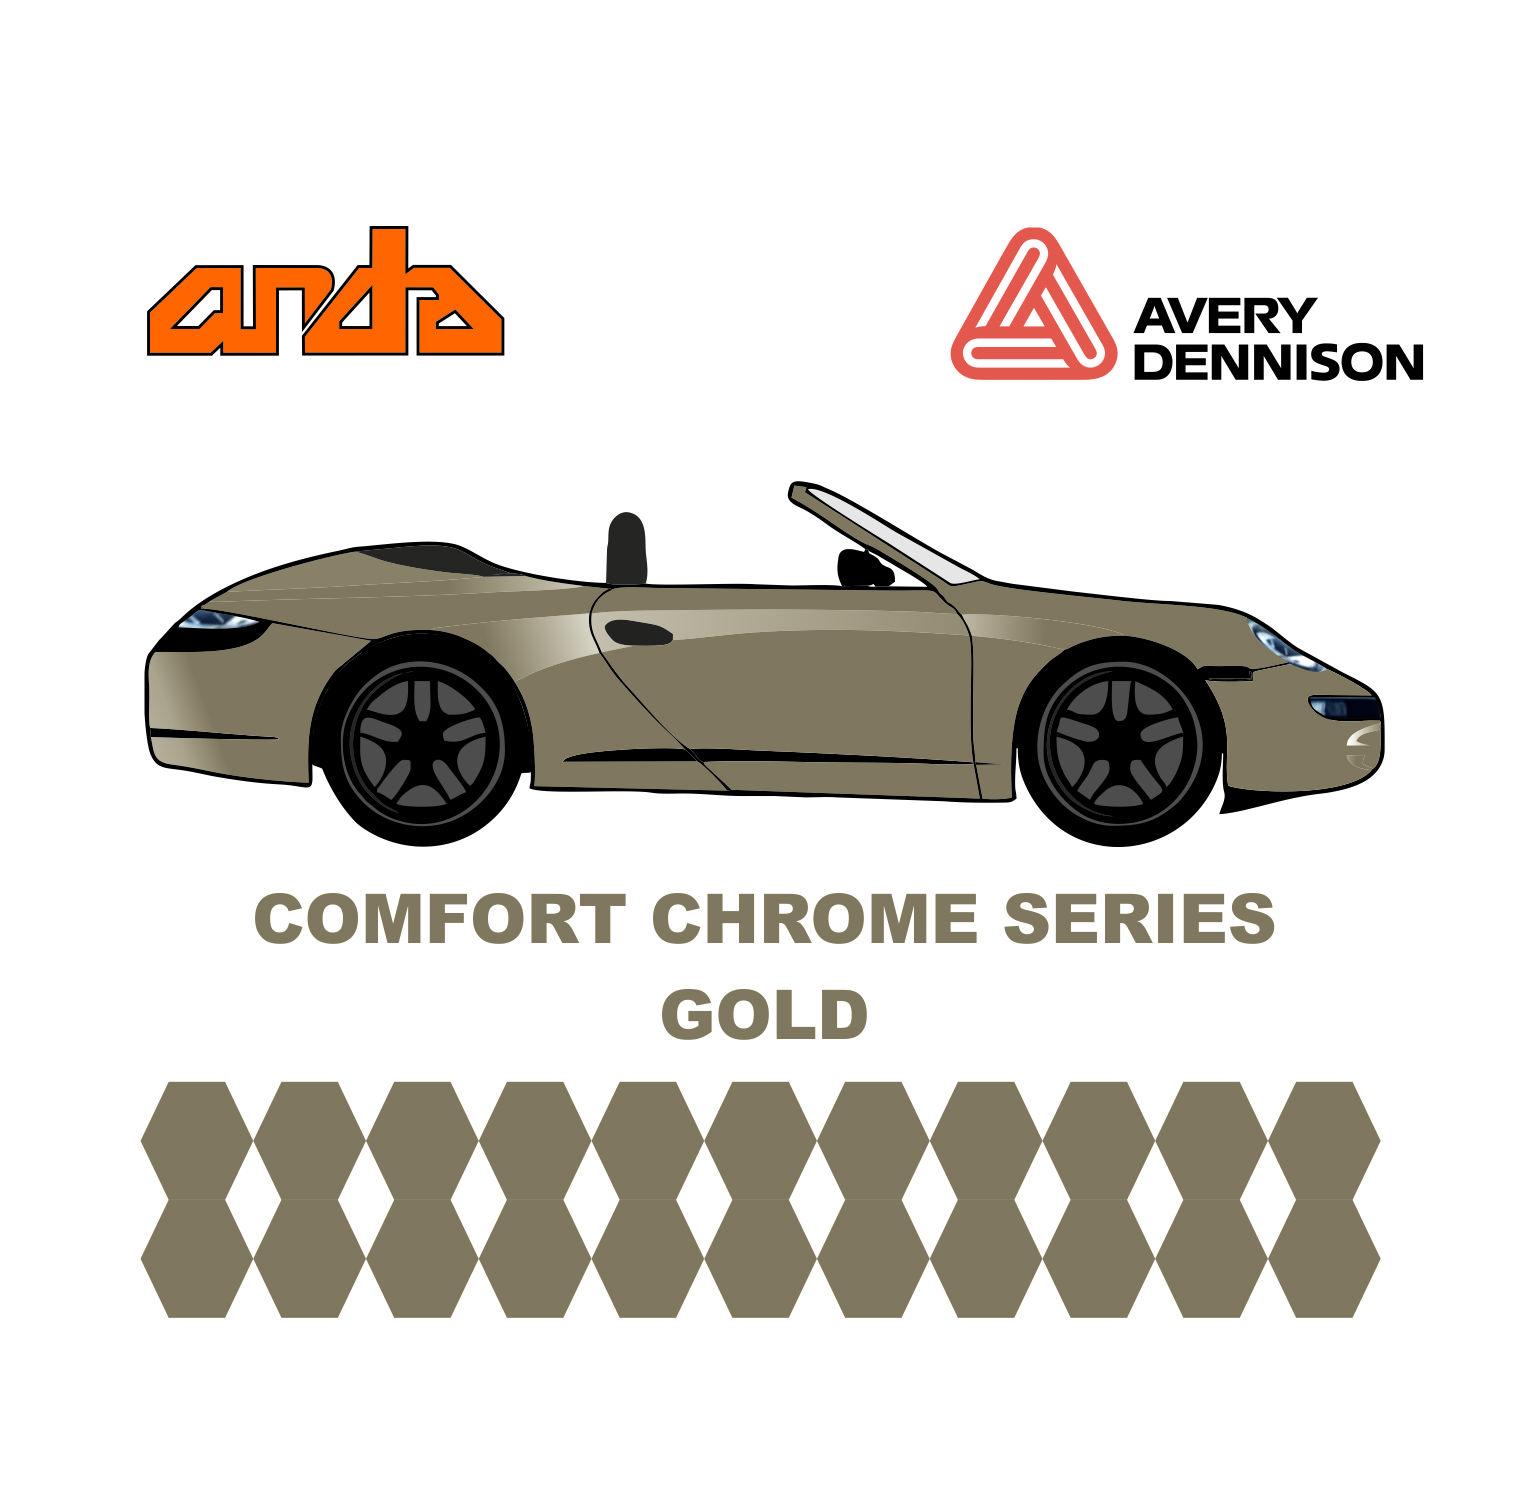 Avery Dennison- SWF Comform Chrome Gold 1